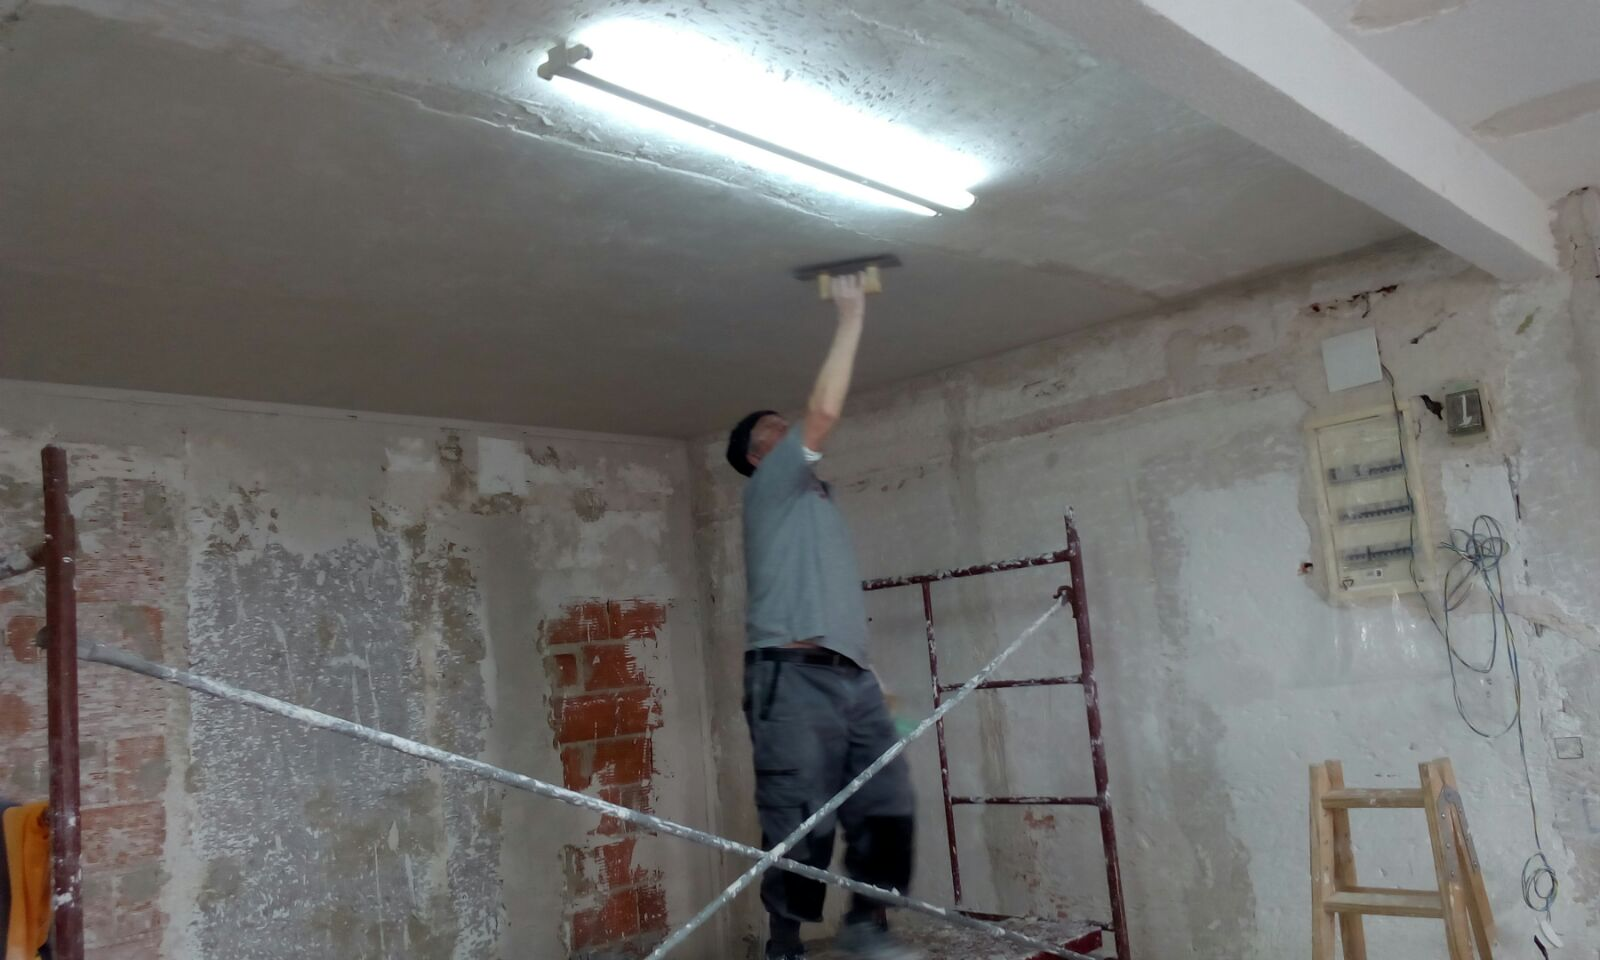 Taller De Empleo Benidorm Iv Revestimientos